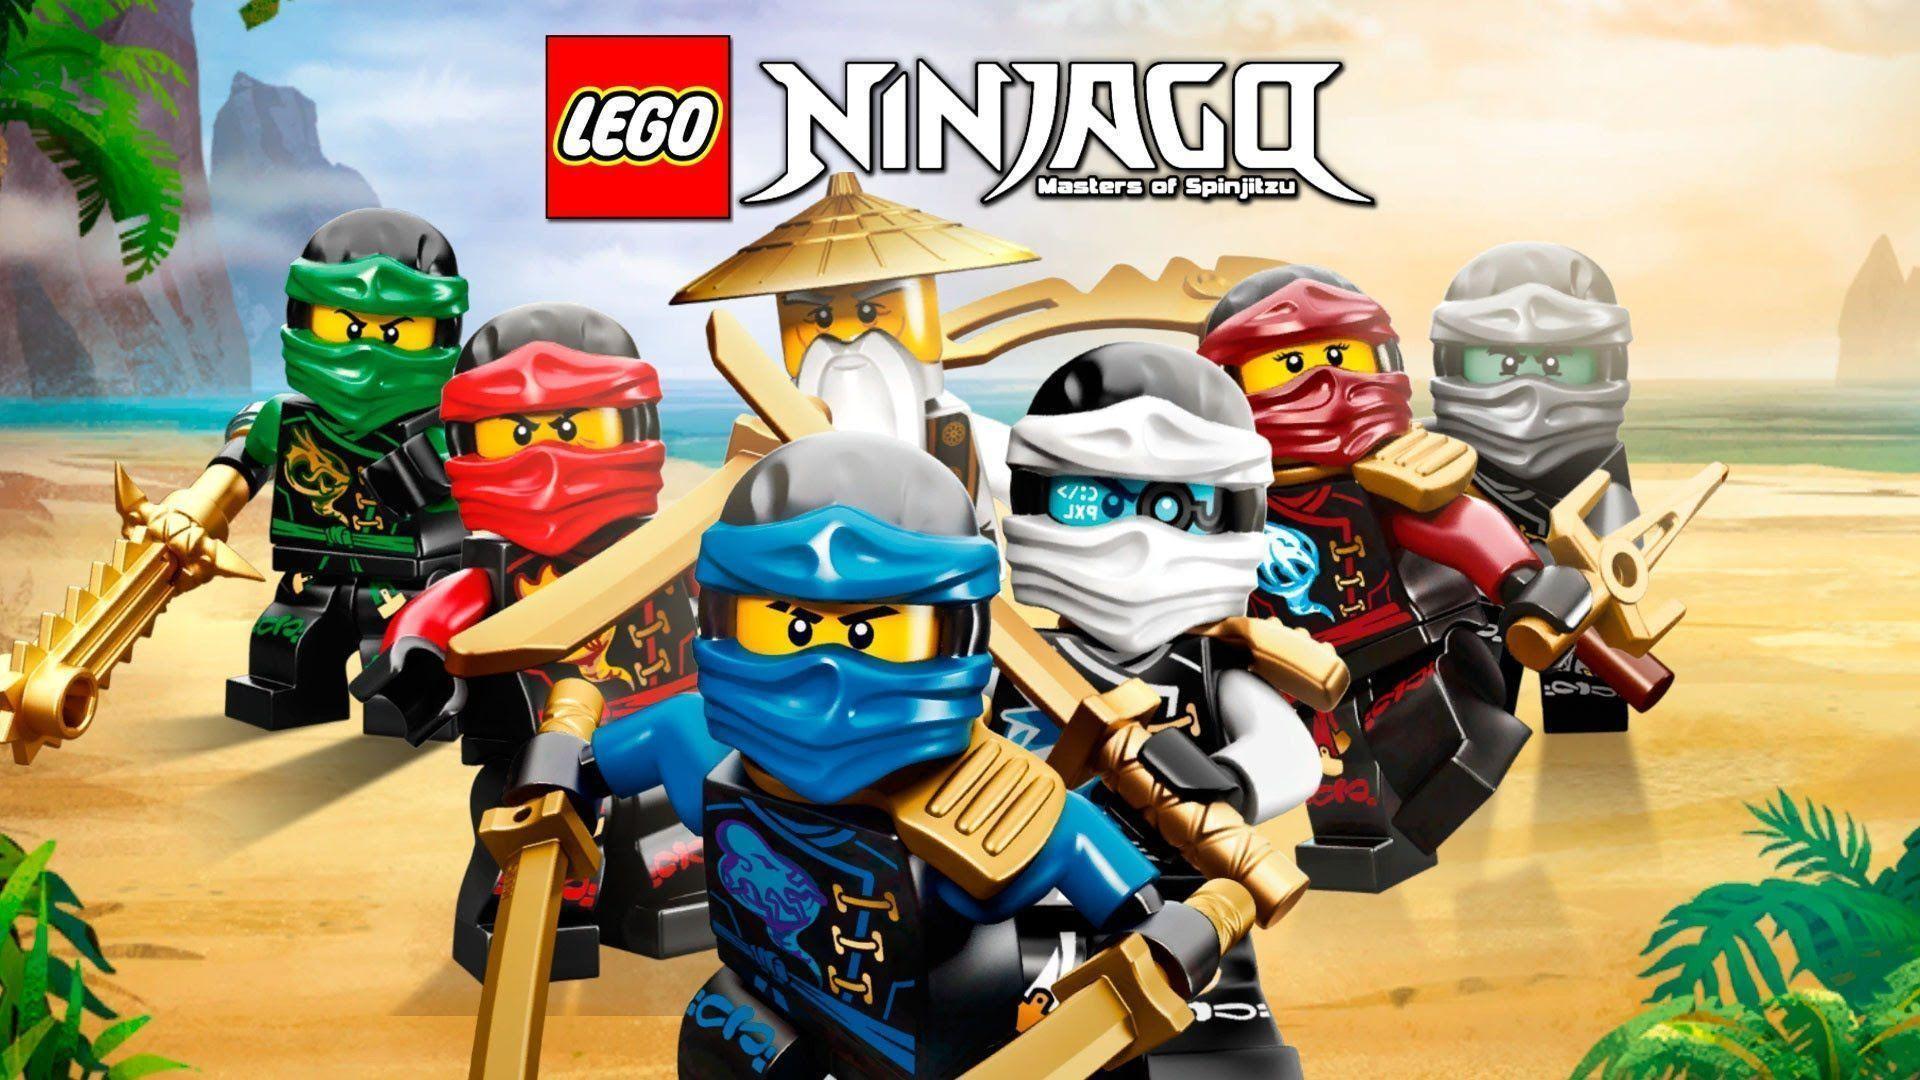 lego ninjago wallpaper HD – wallpapermonkey.com